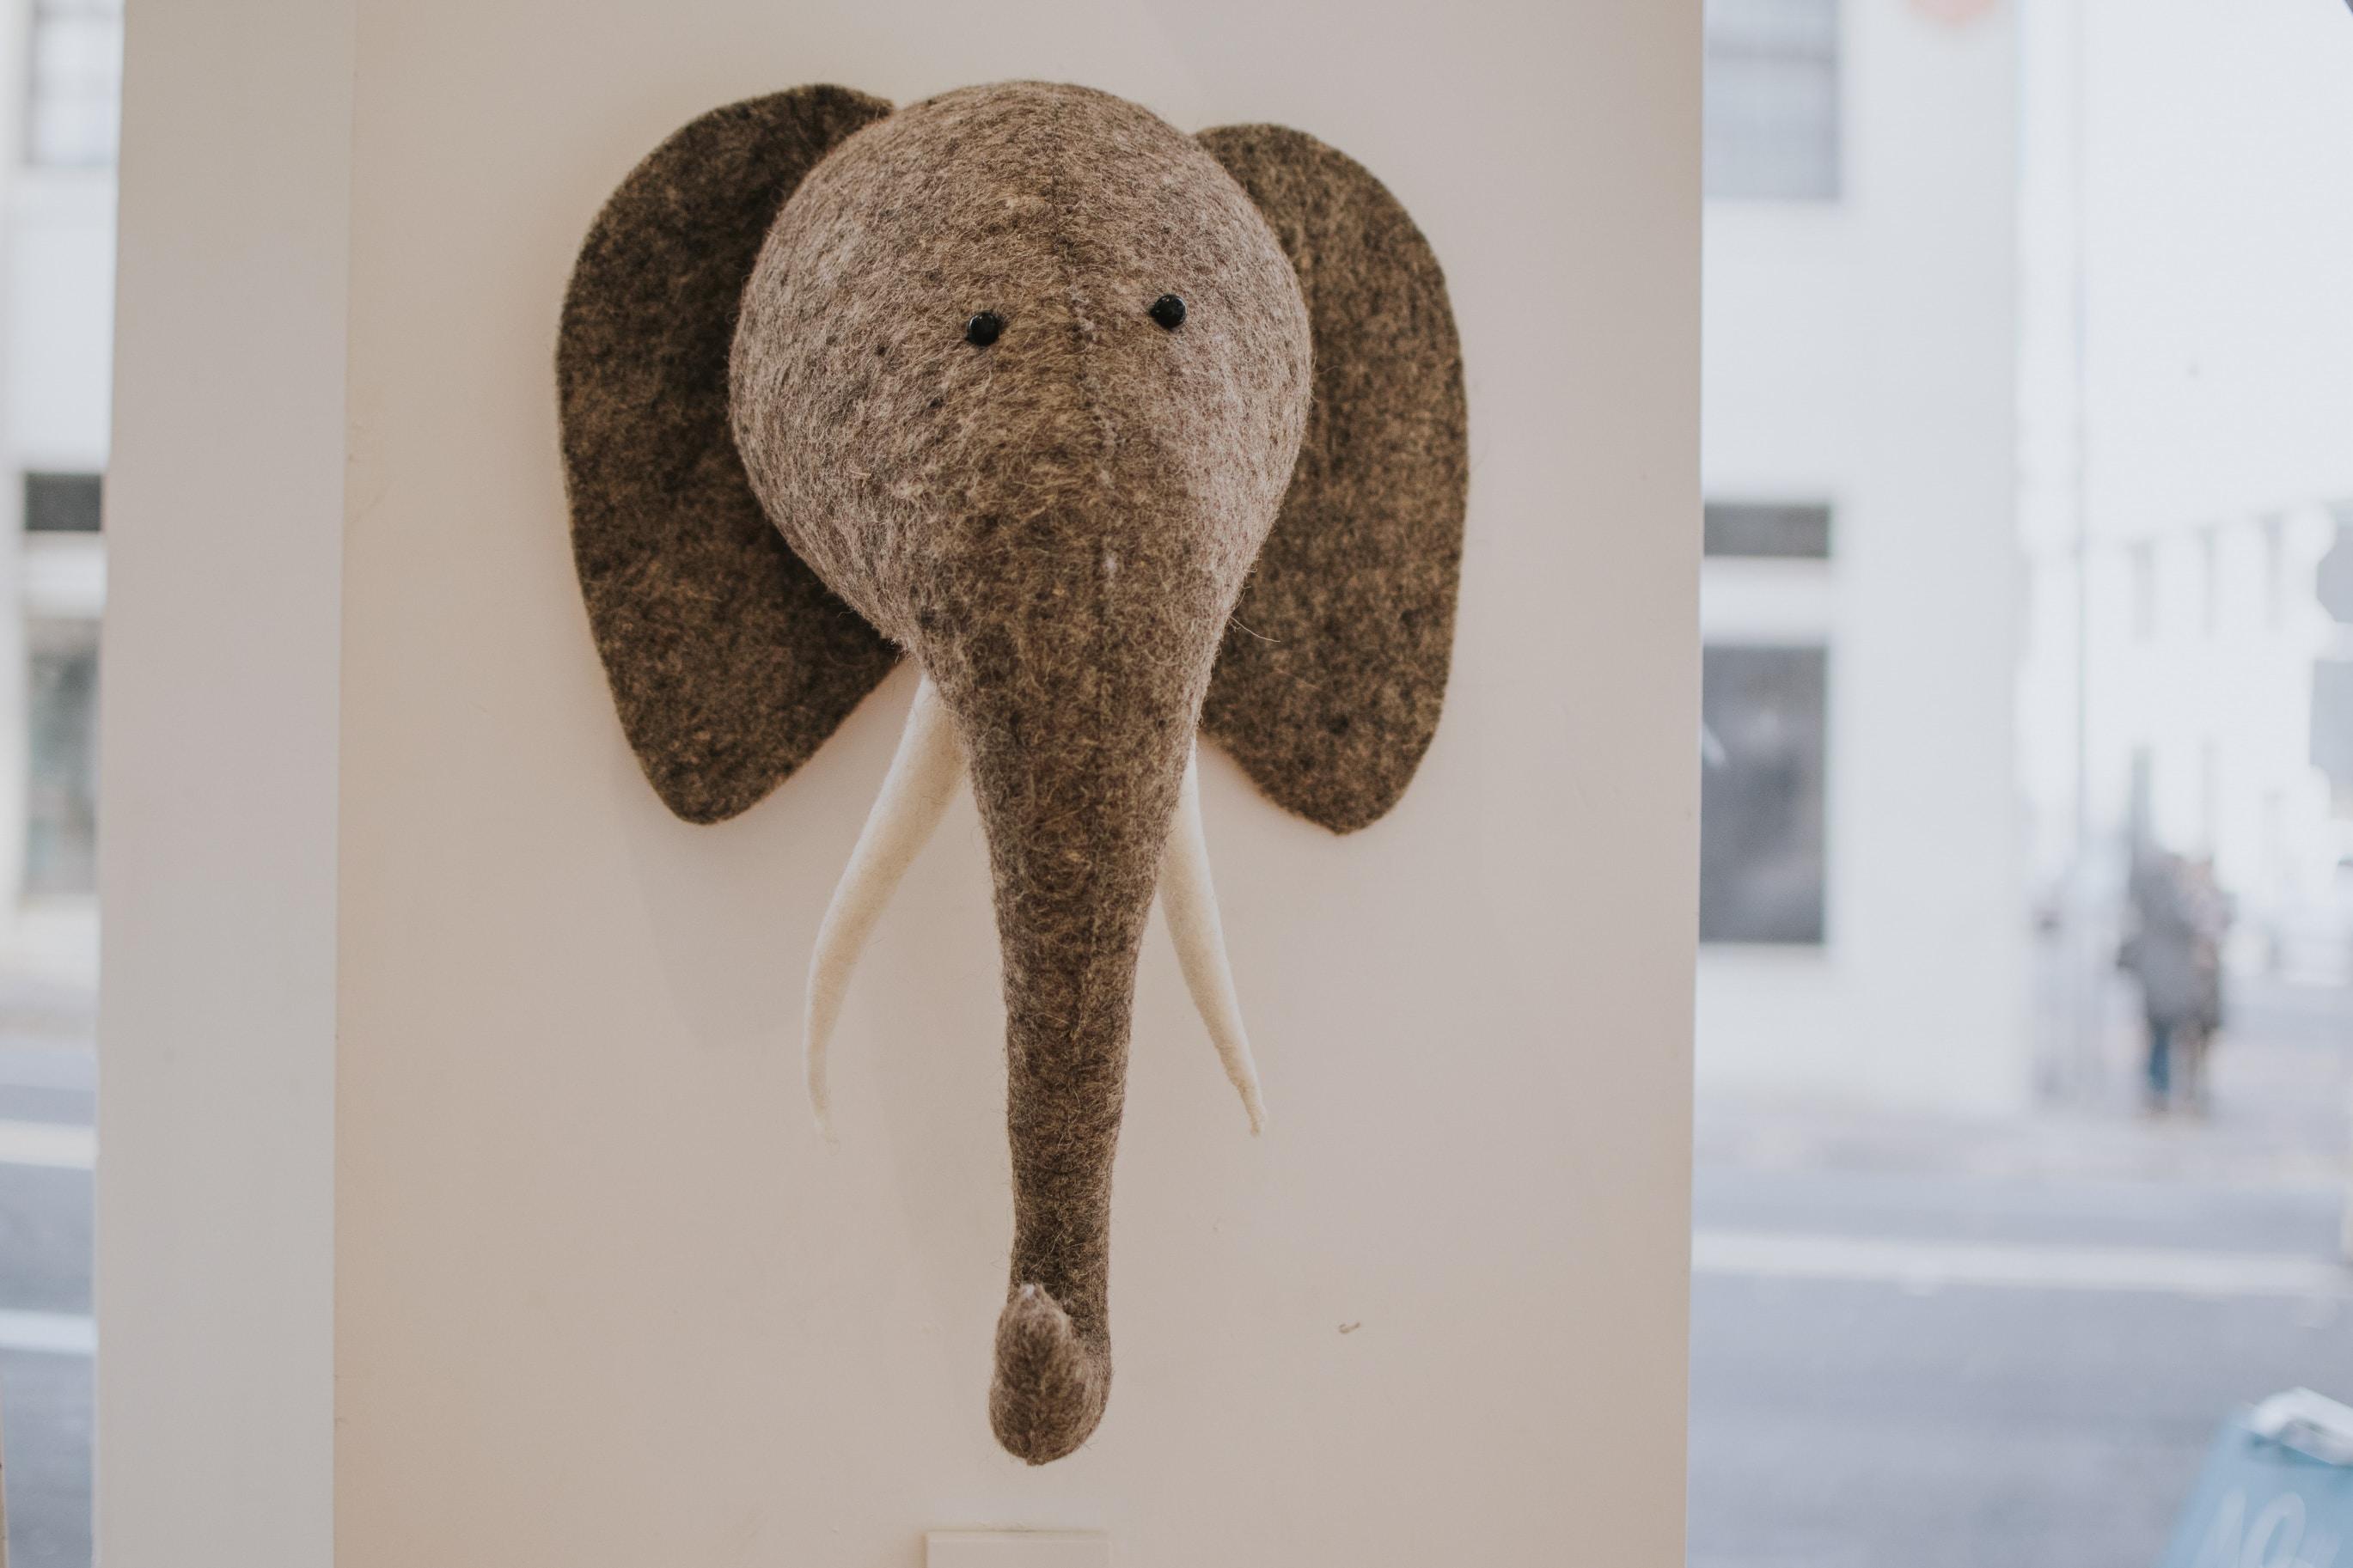 gray elephant head figure hanging on wall